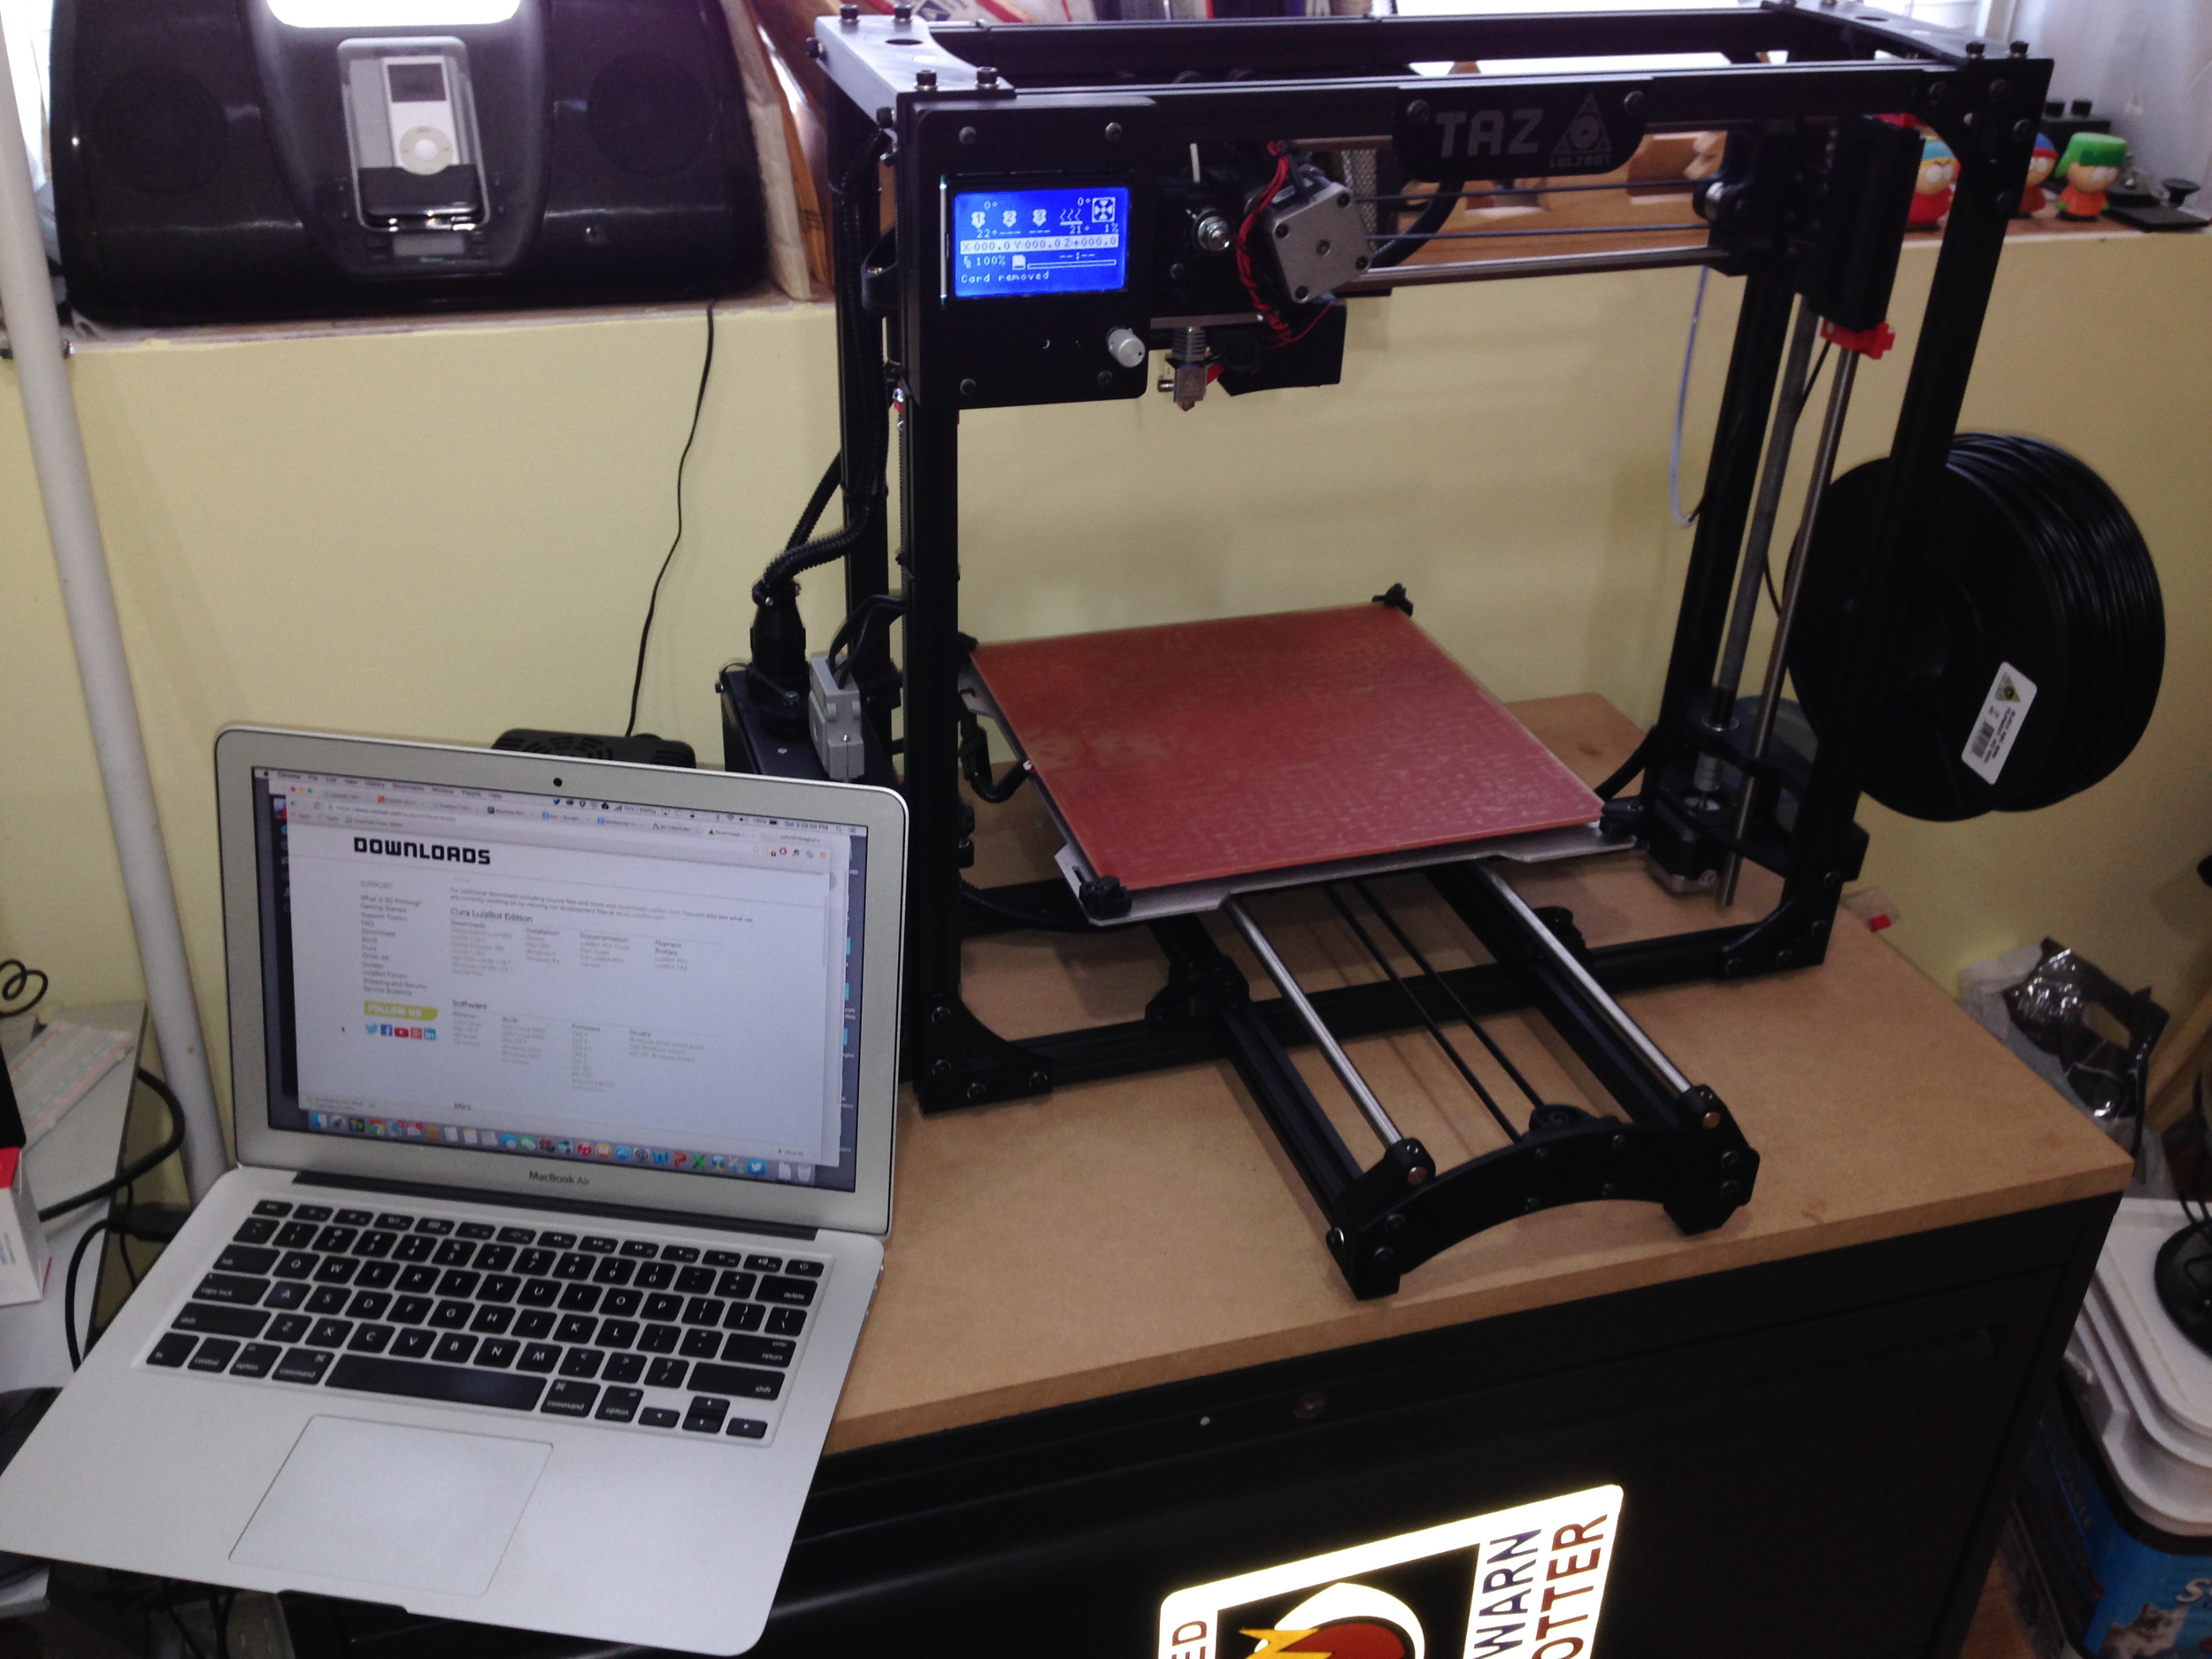 Setup and calibration